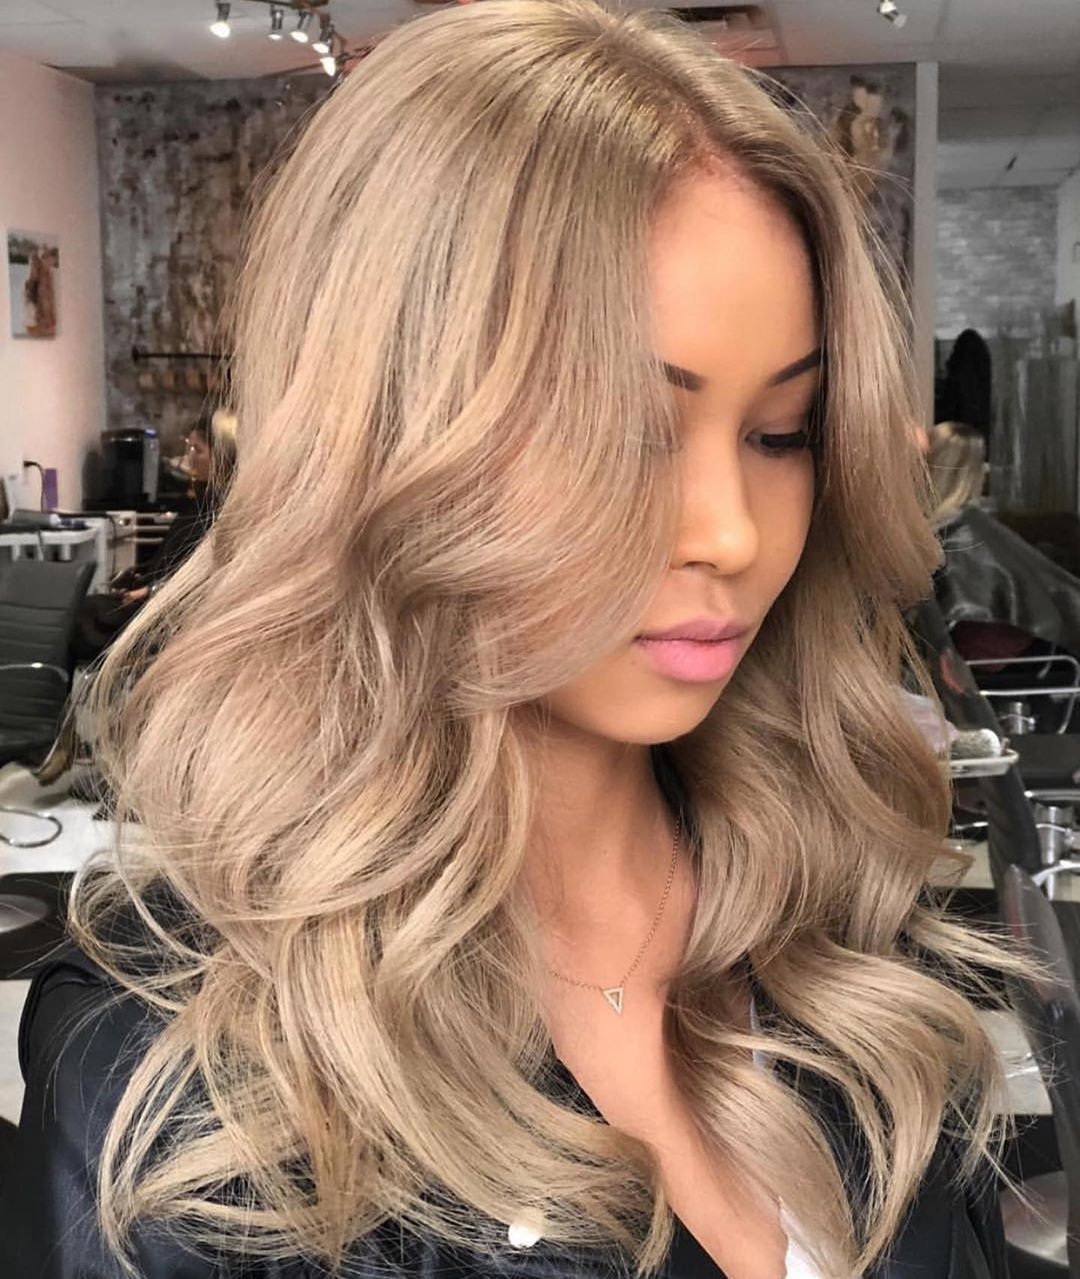 Josie Vilay On Instagram Salty Caramel Not Every Blonde Has To Be Platinum Blonde Find Your Mi Beige Blonde Hair Hair Color Caramel Blonde Asian Hair